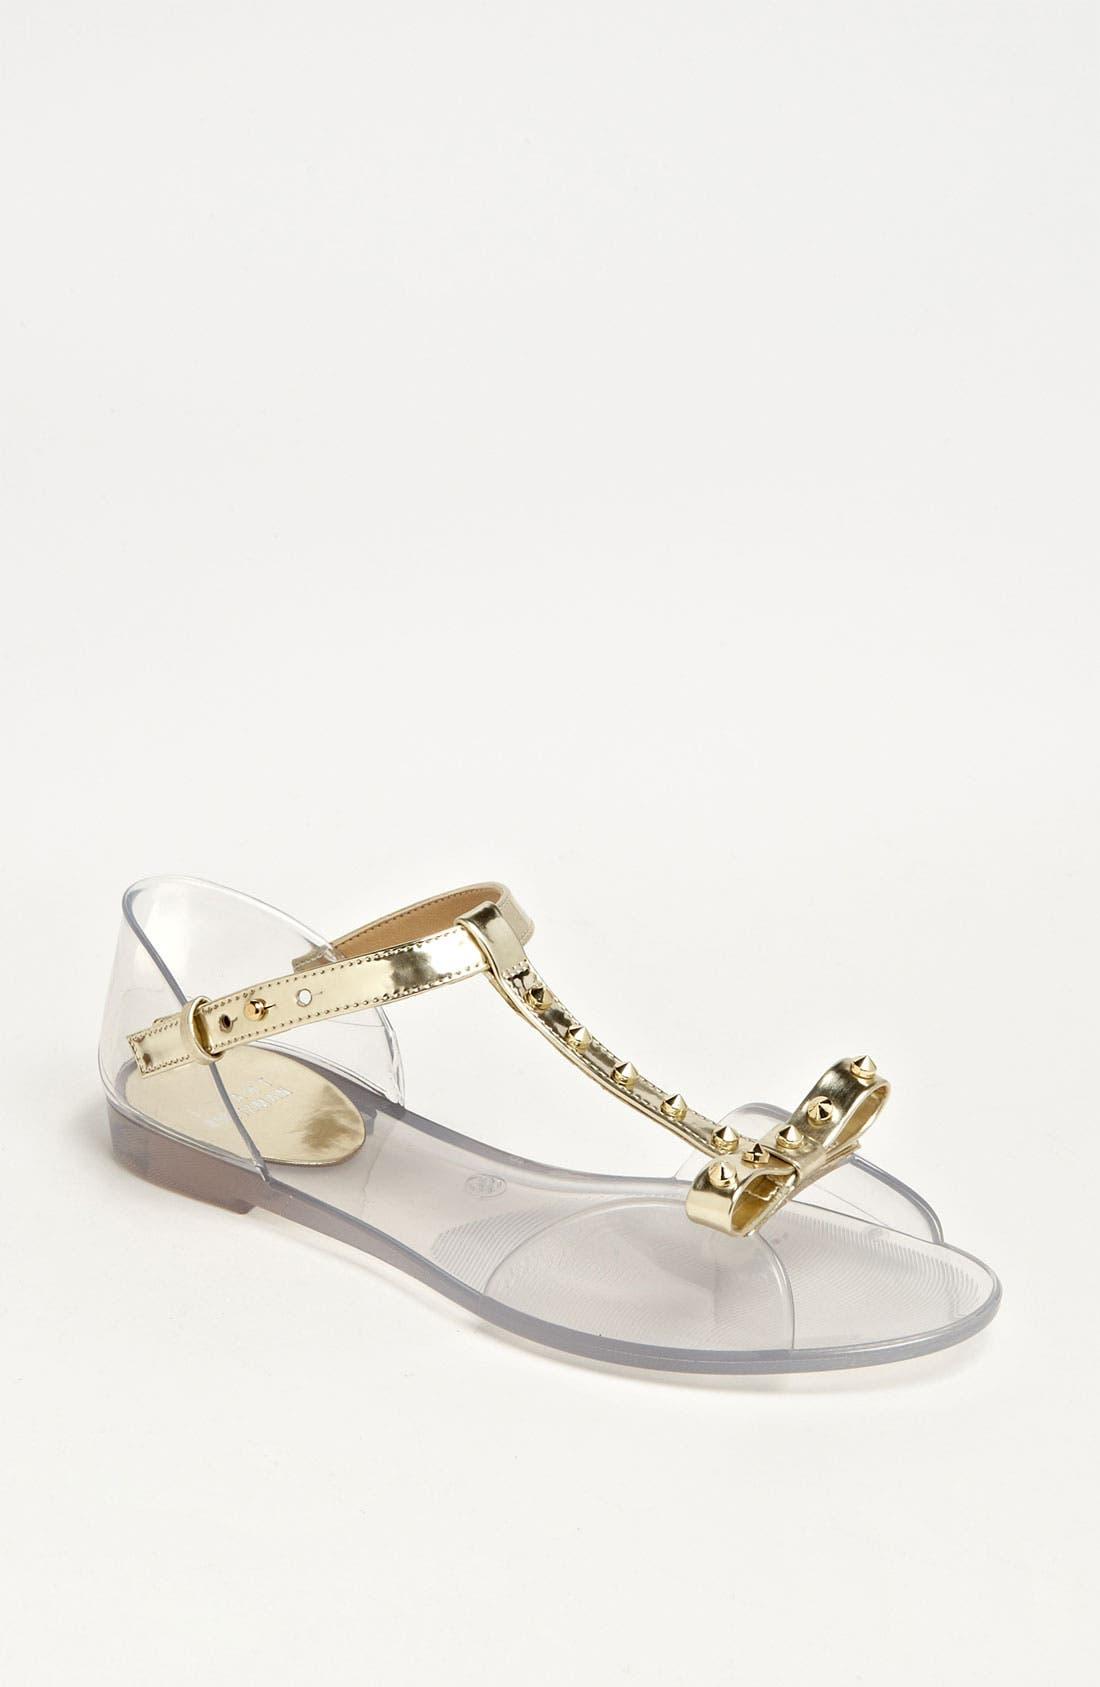 Alternate Image 1 Selected - Stuart Weitzman 'Nifty' Sandal